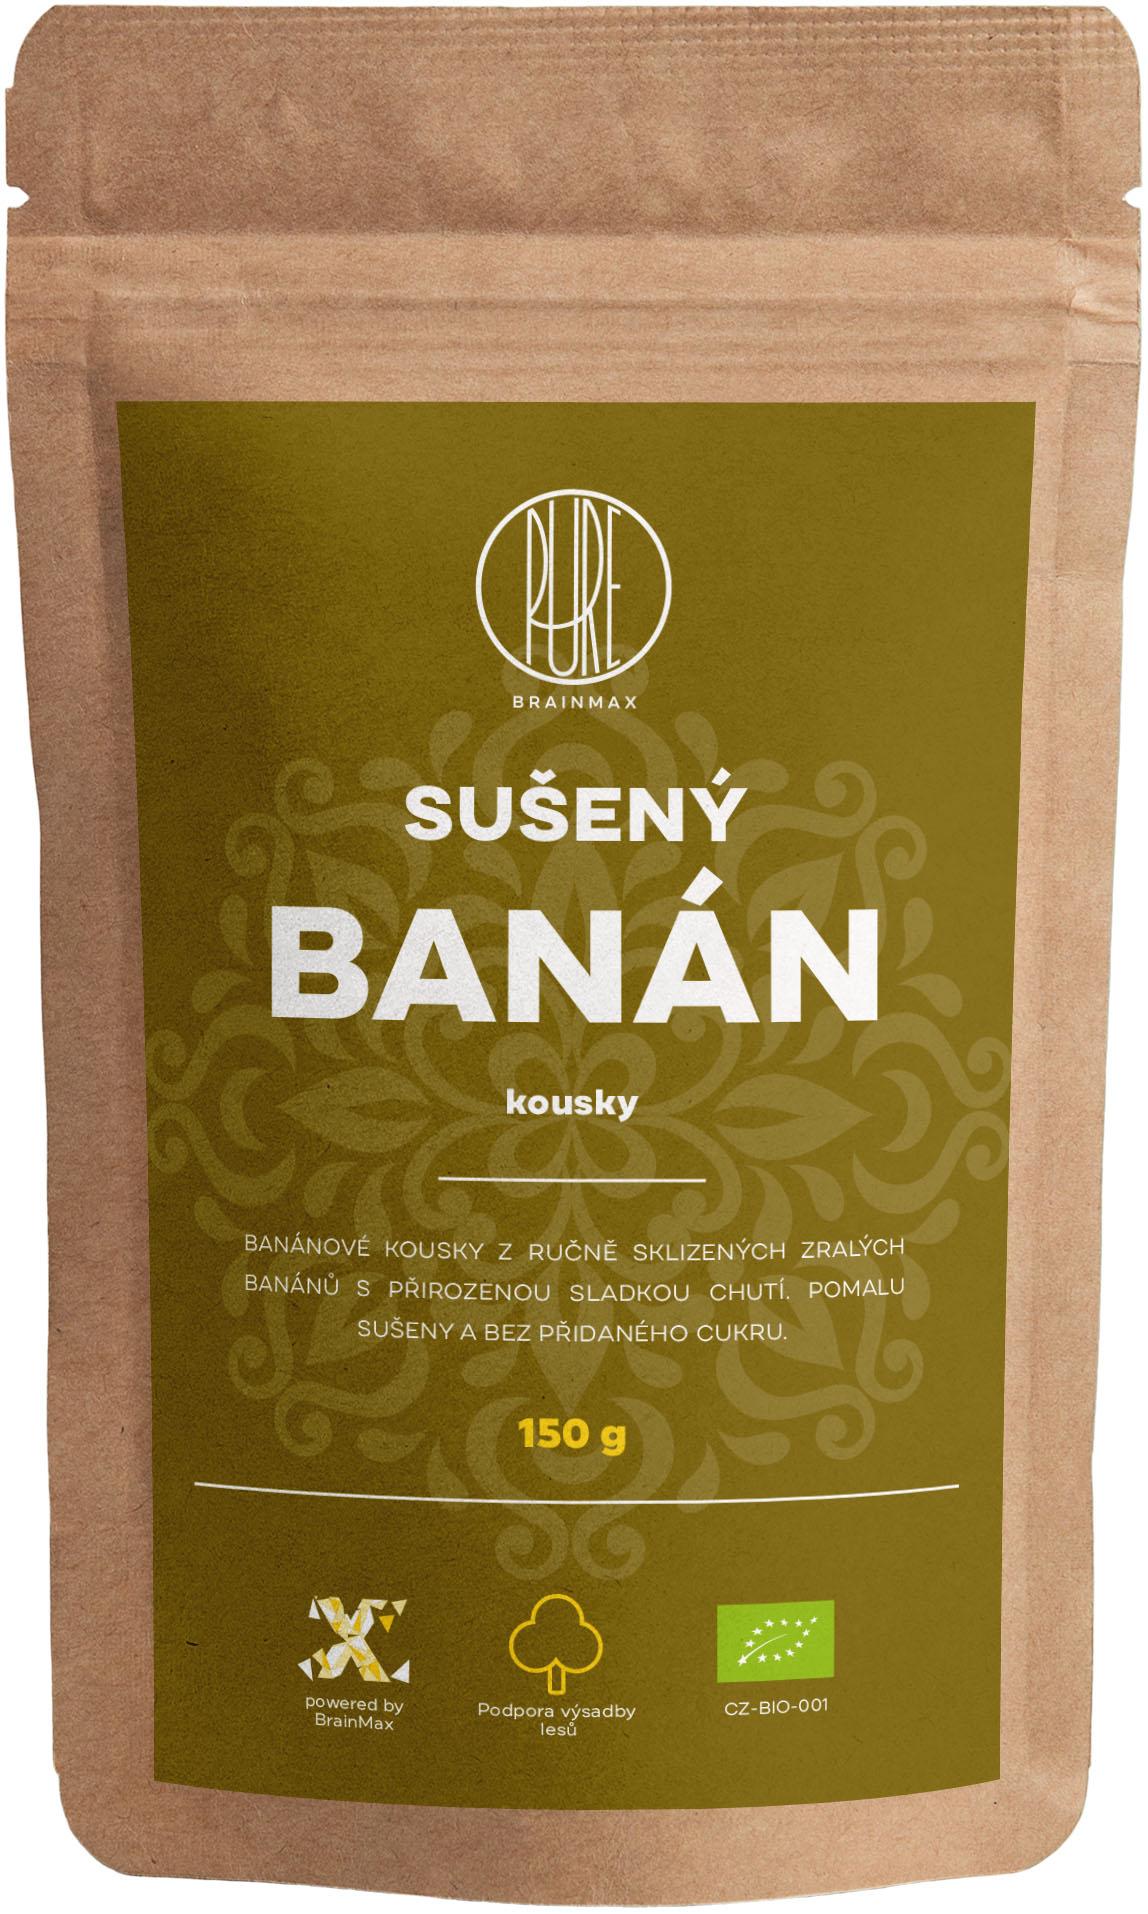 BrainMax Pure Sušený banán - kousky BIO, 150 g *CZ-BIO-001 certifikát